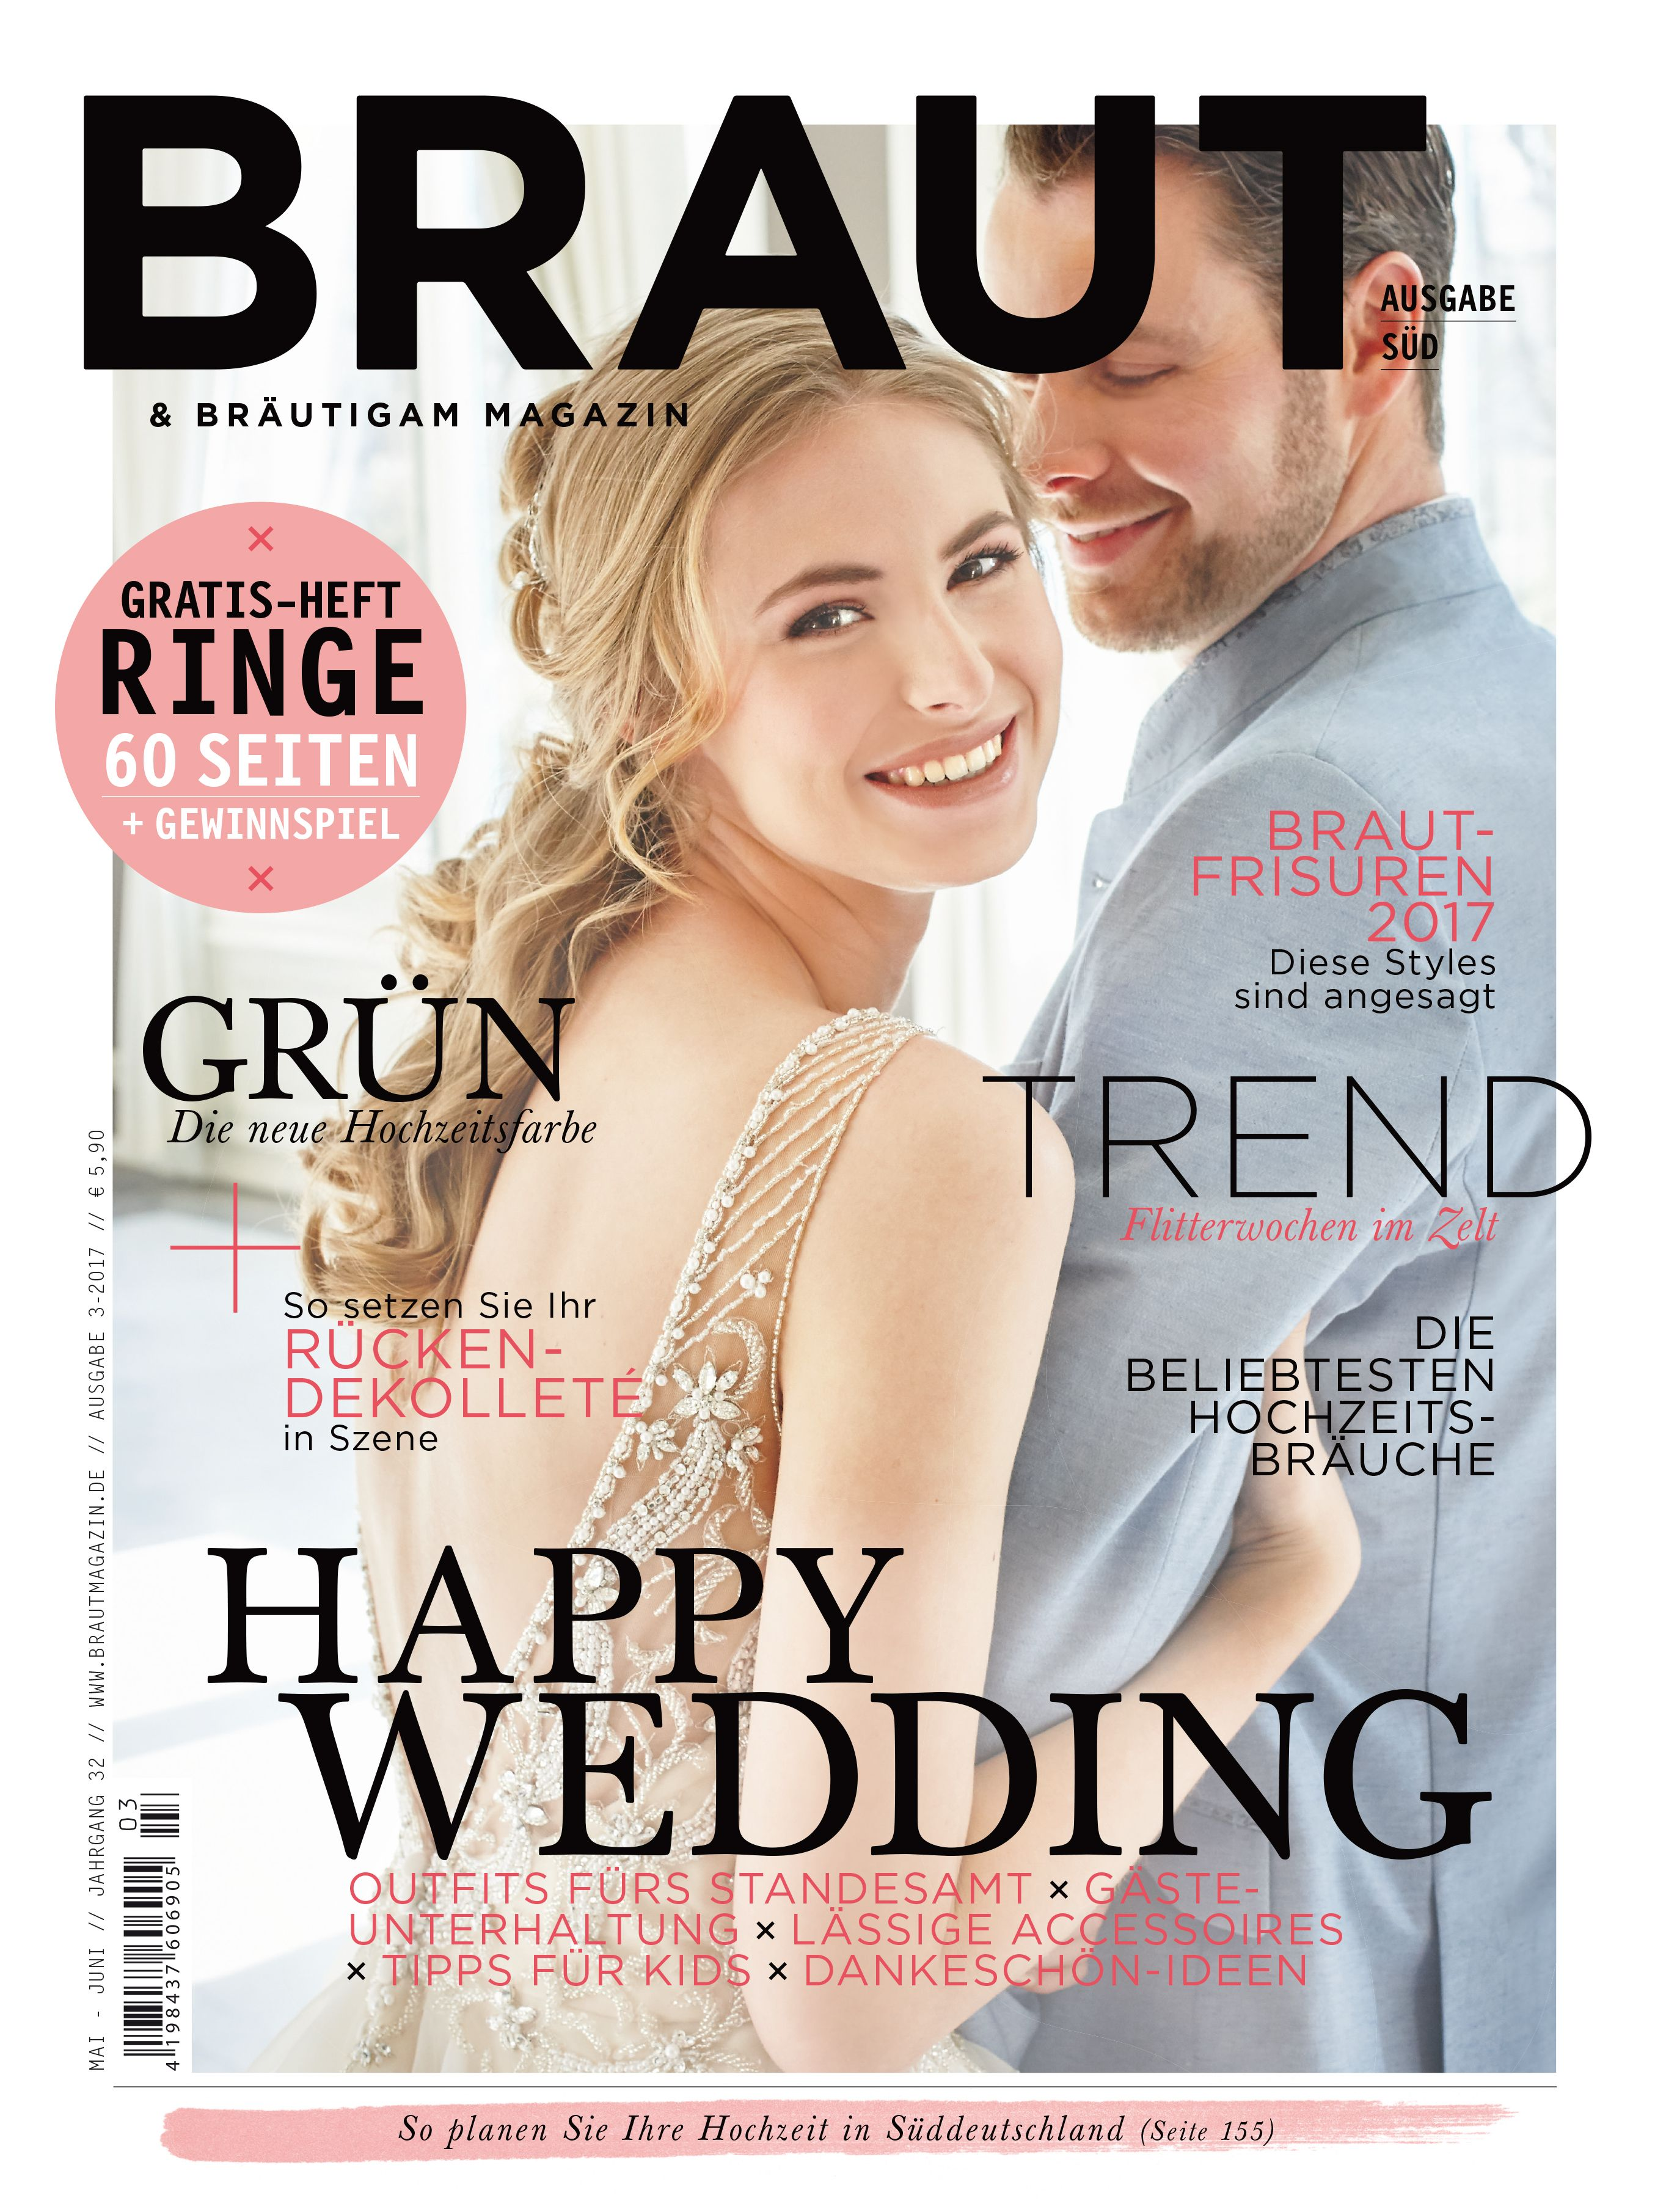 Braut & Bräutigam Magazin – Ausgabe 3-2017 #Brautmagazin ...